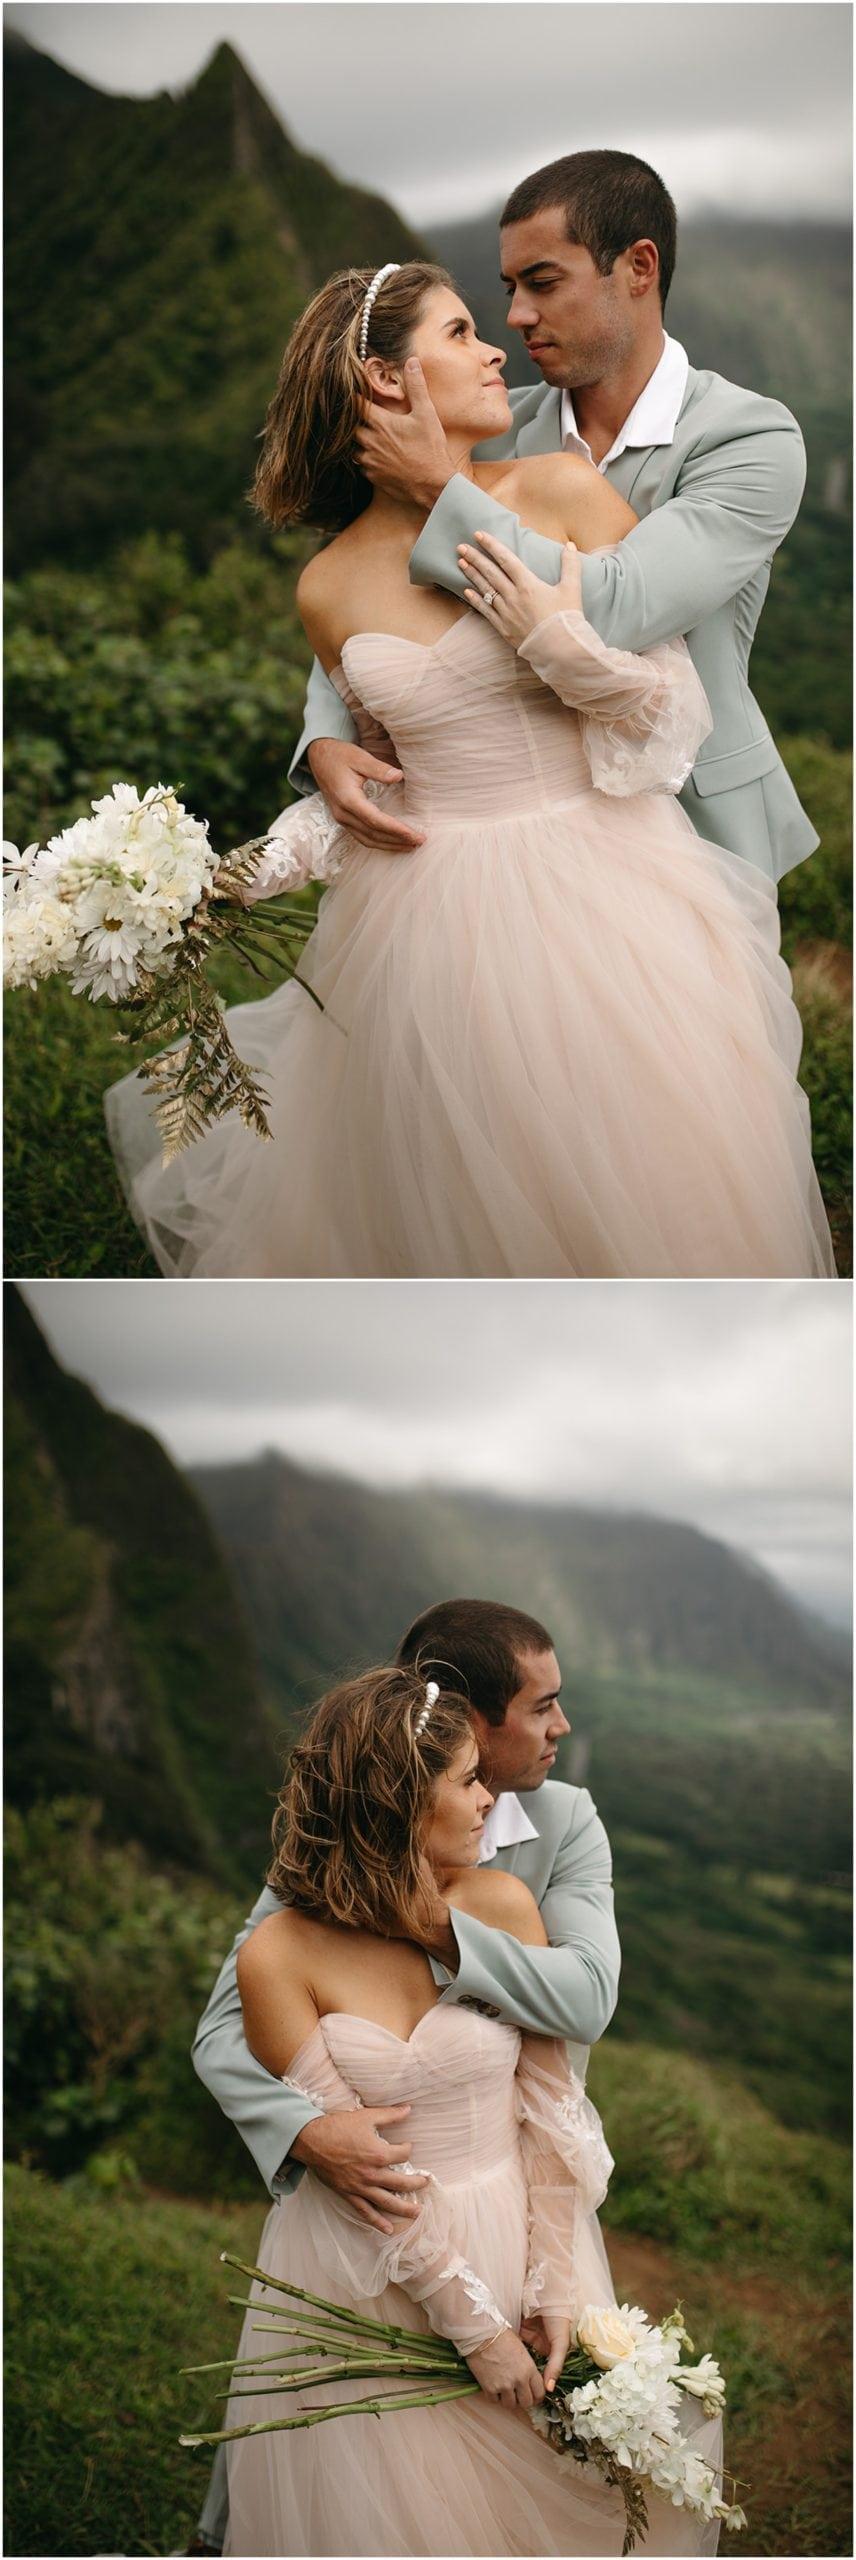 adventure elopement in mountains